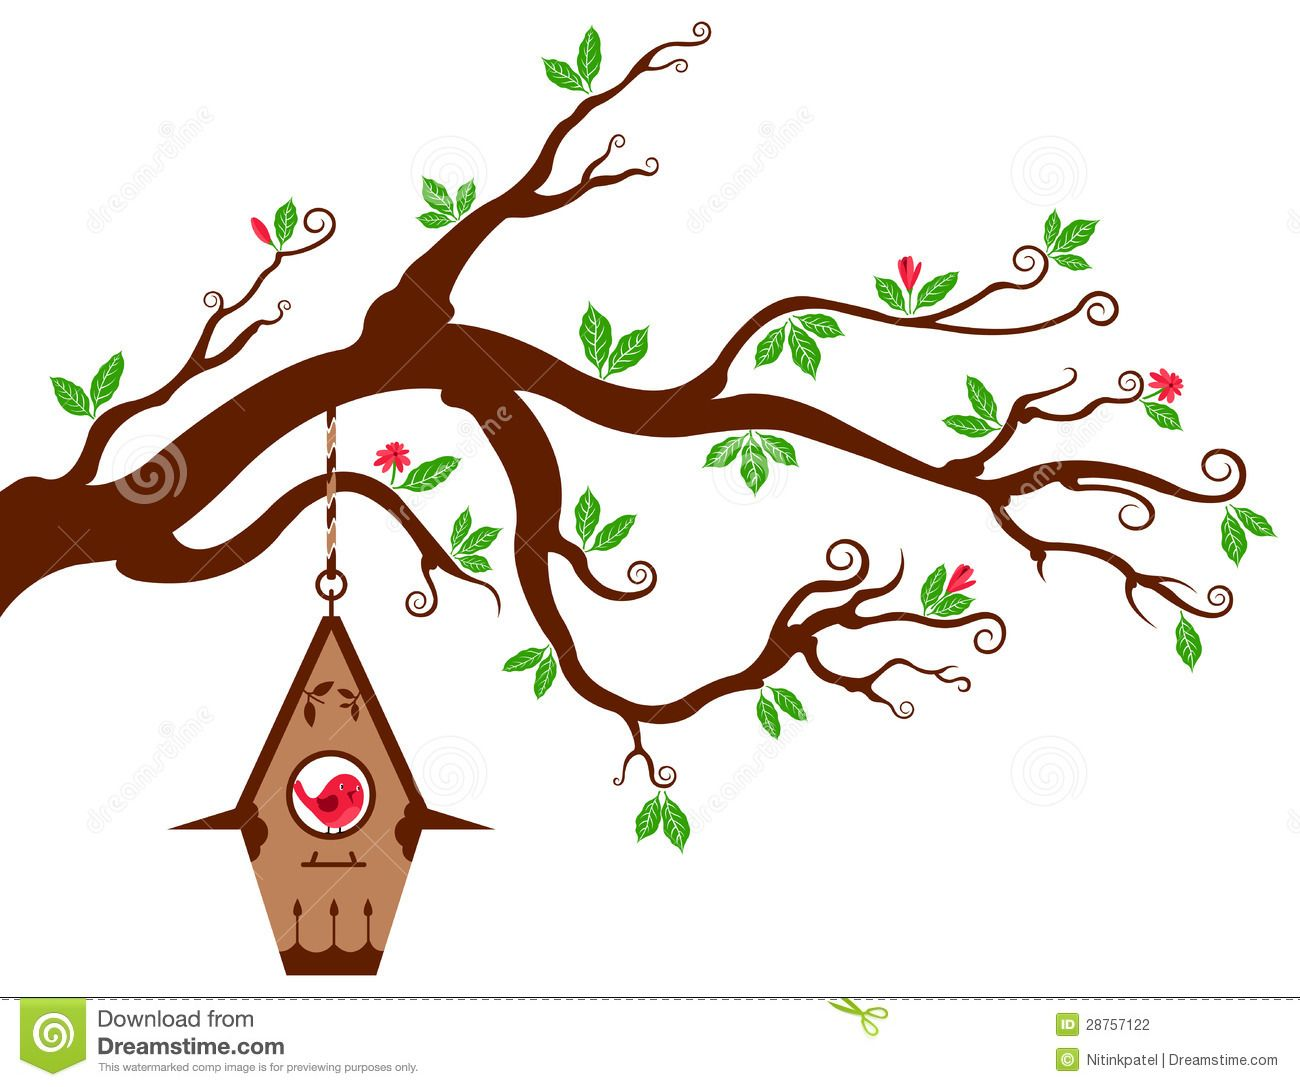 Cute branch google search. Birdhouse clipart tree clipart